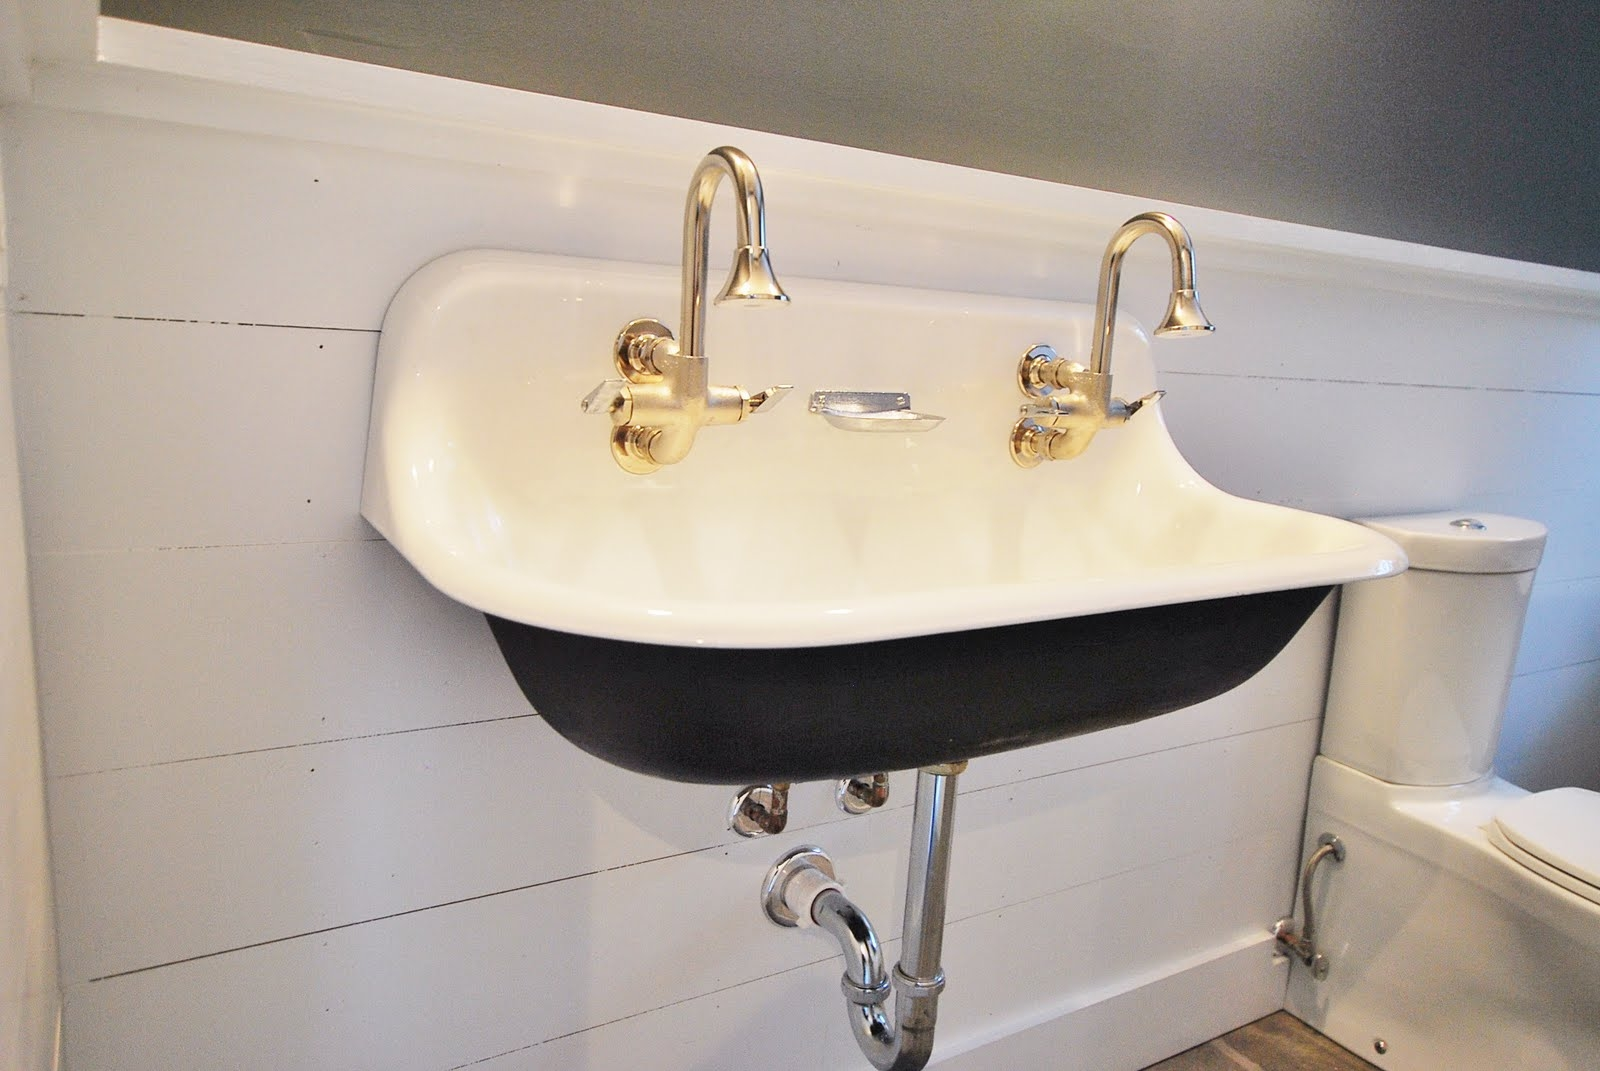 Ideas, bathroom charming double trough sink for best bathroom sink for size 1600 x 1071  .